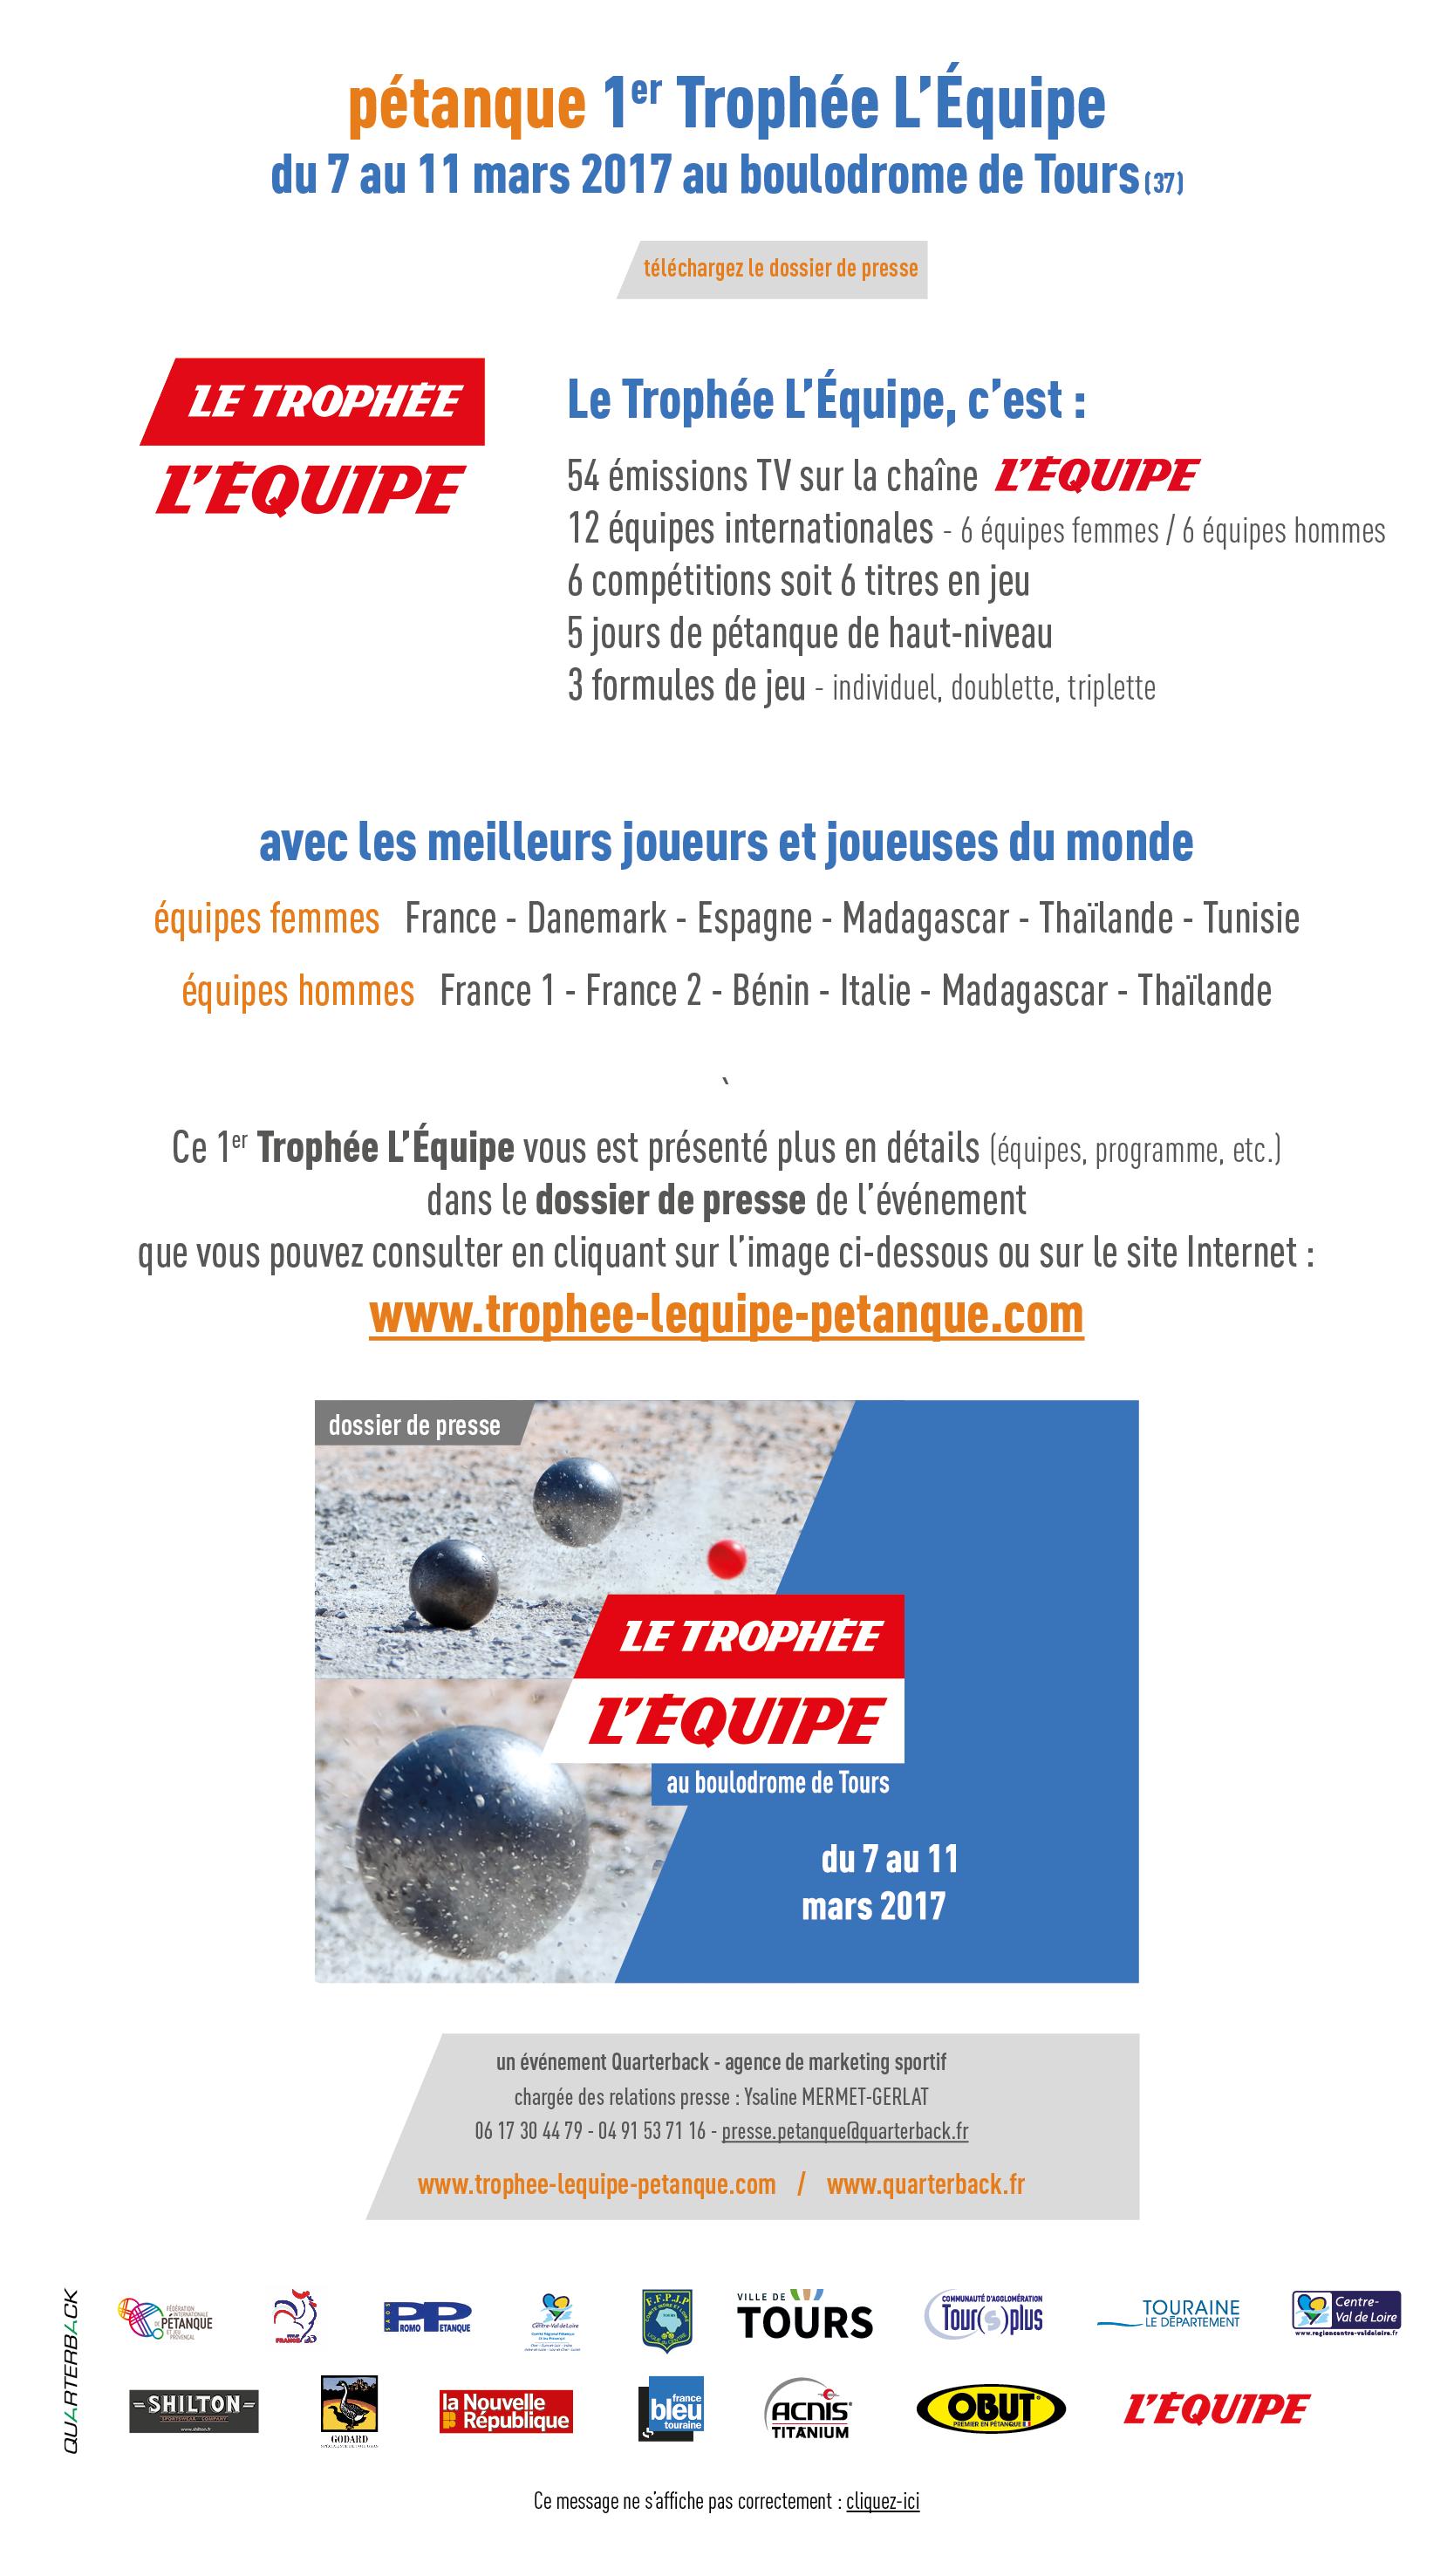 TROPHEE-LEQUIPE-VF-DOSSIER-DE-PRESSE